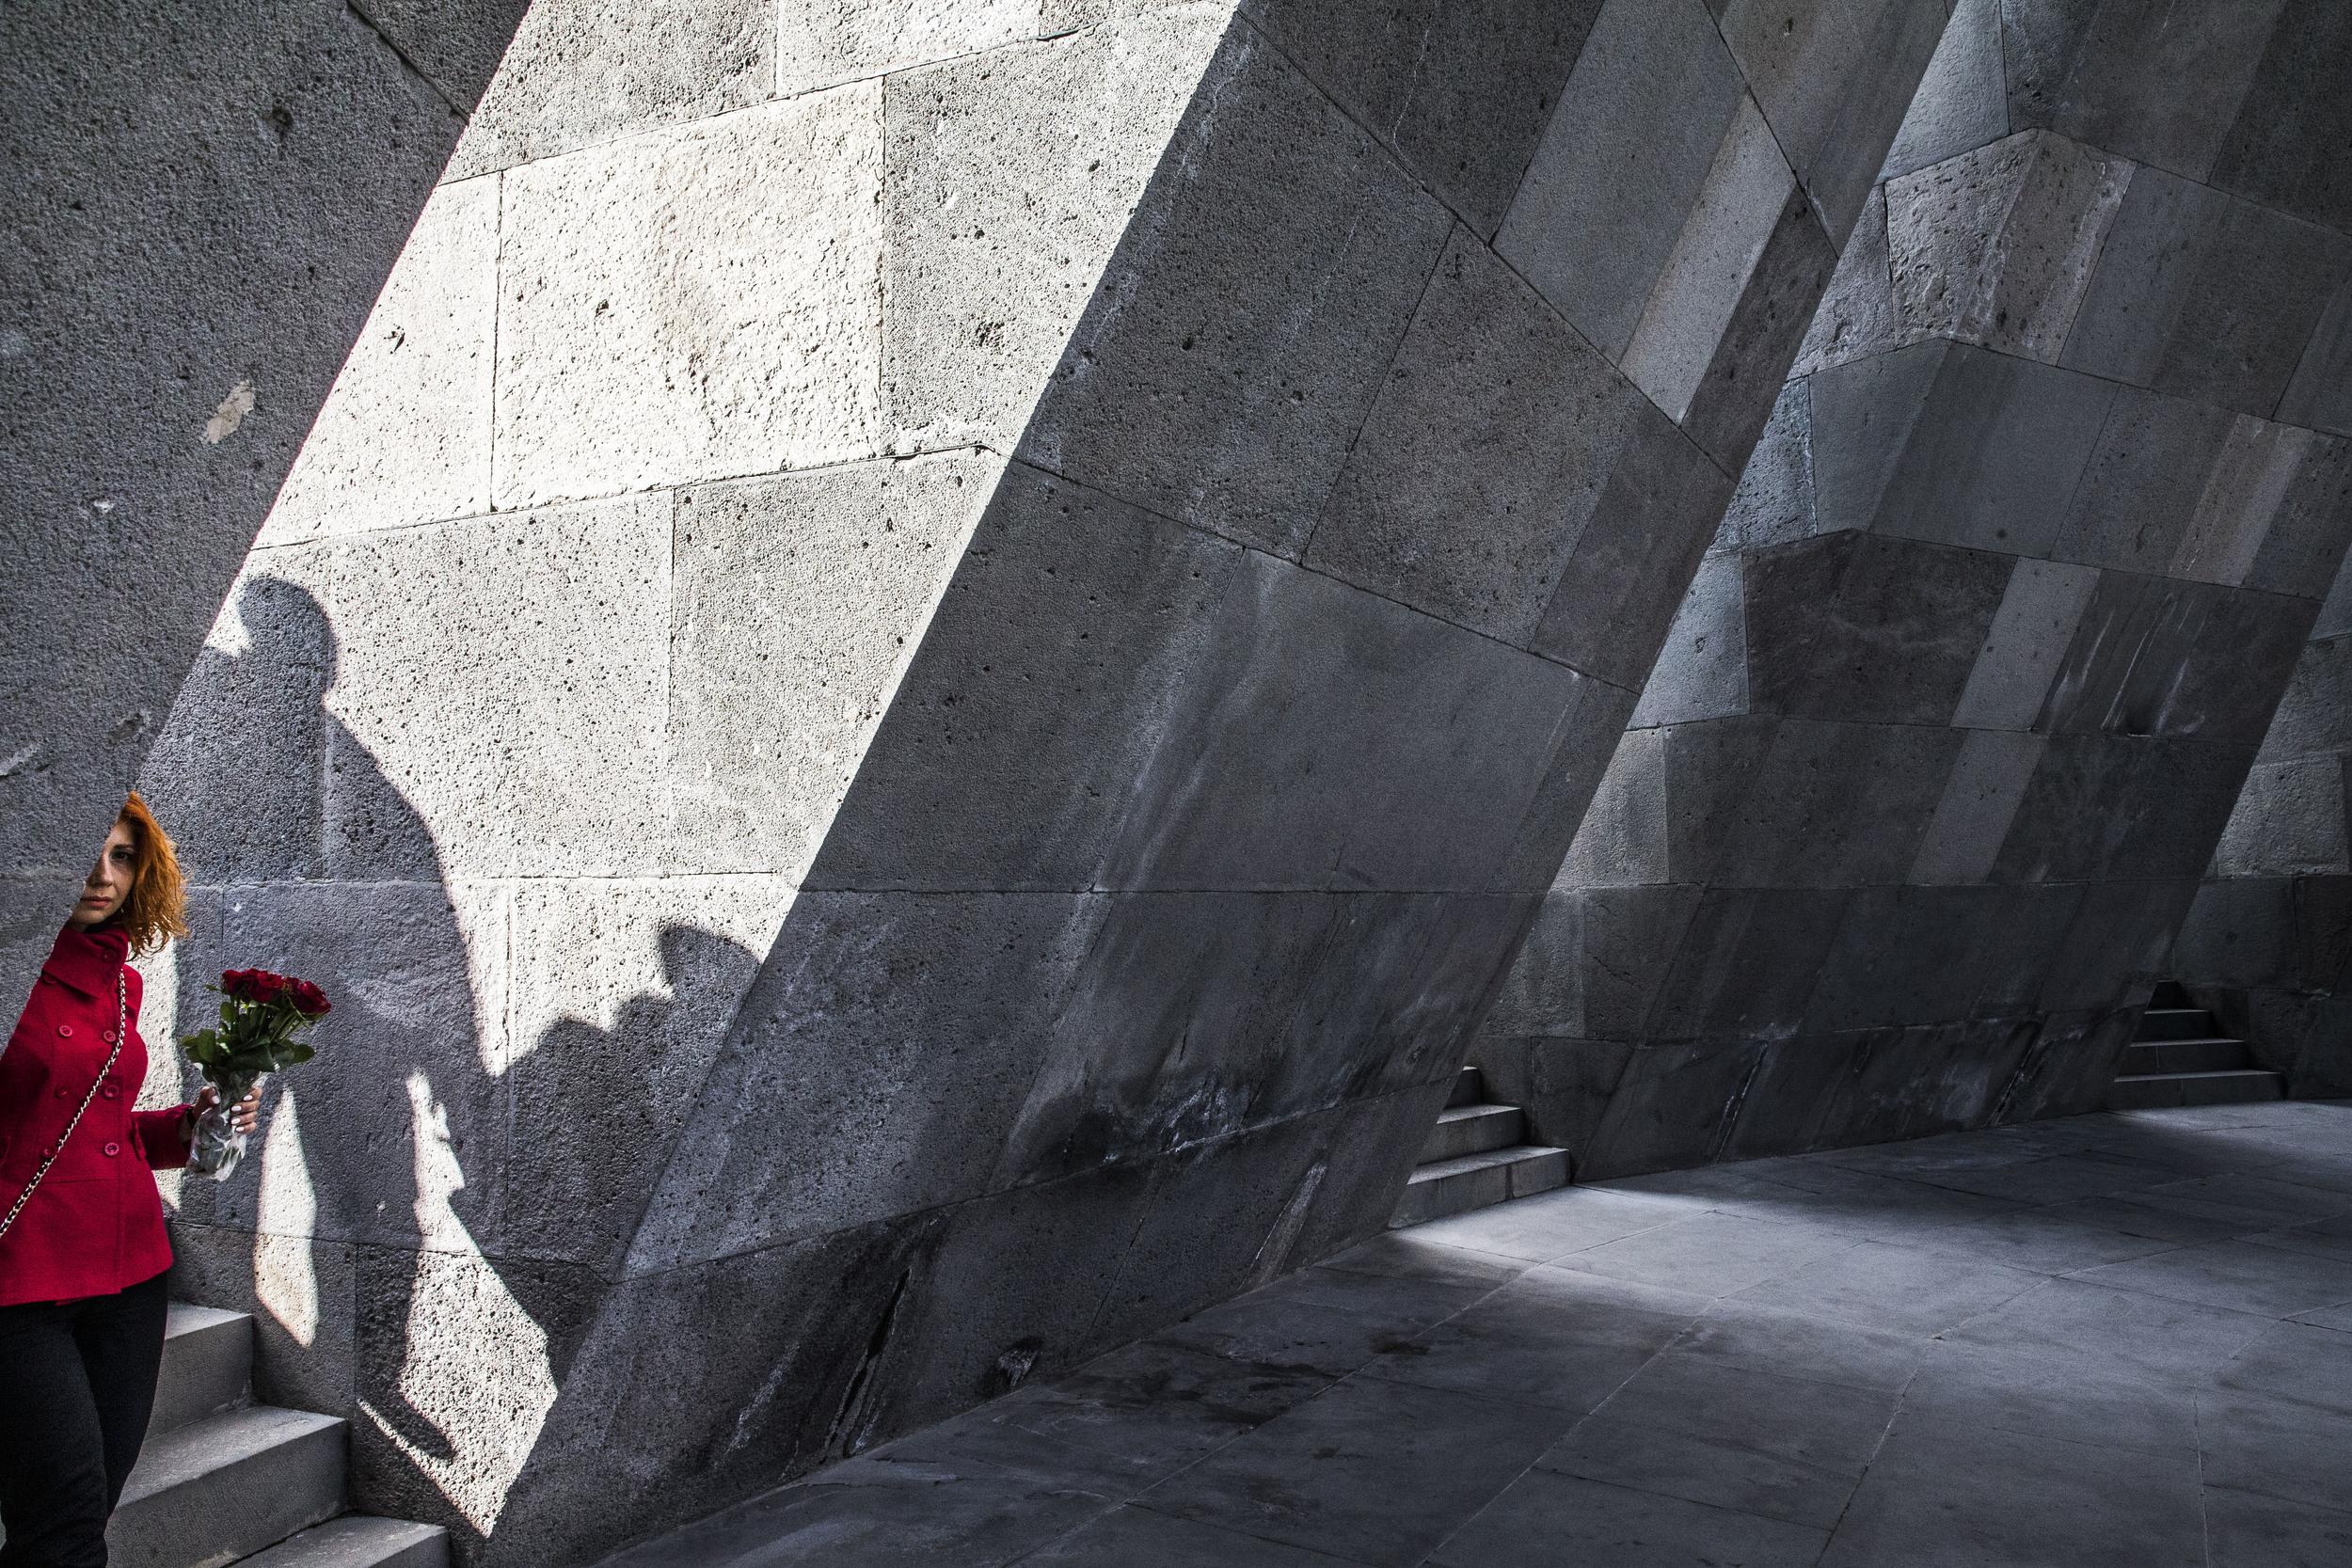 Armenian genocide centennial at Tsitsernakaberd memorial complex in Yerevan, Armenia. April 22, 2015